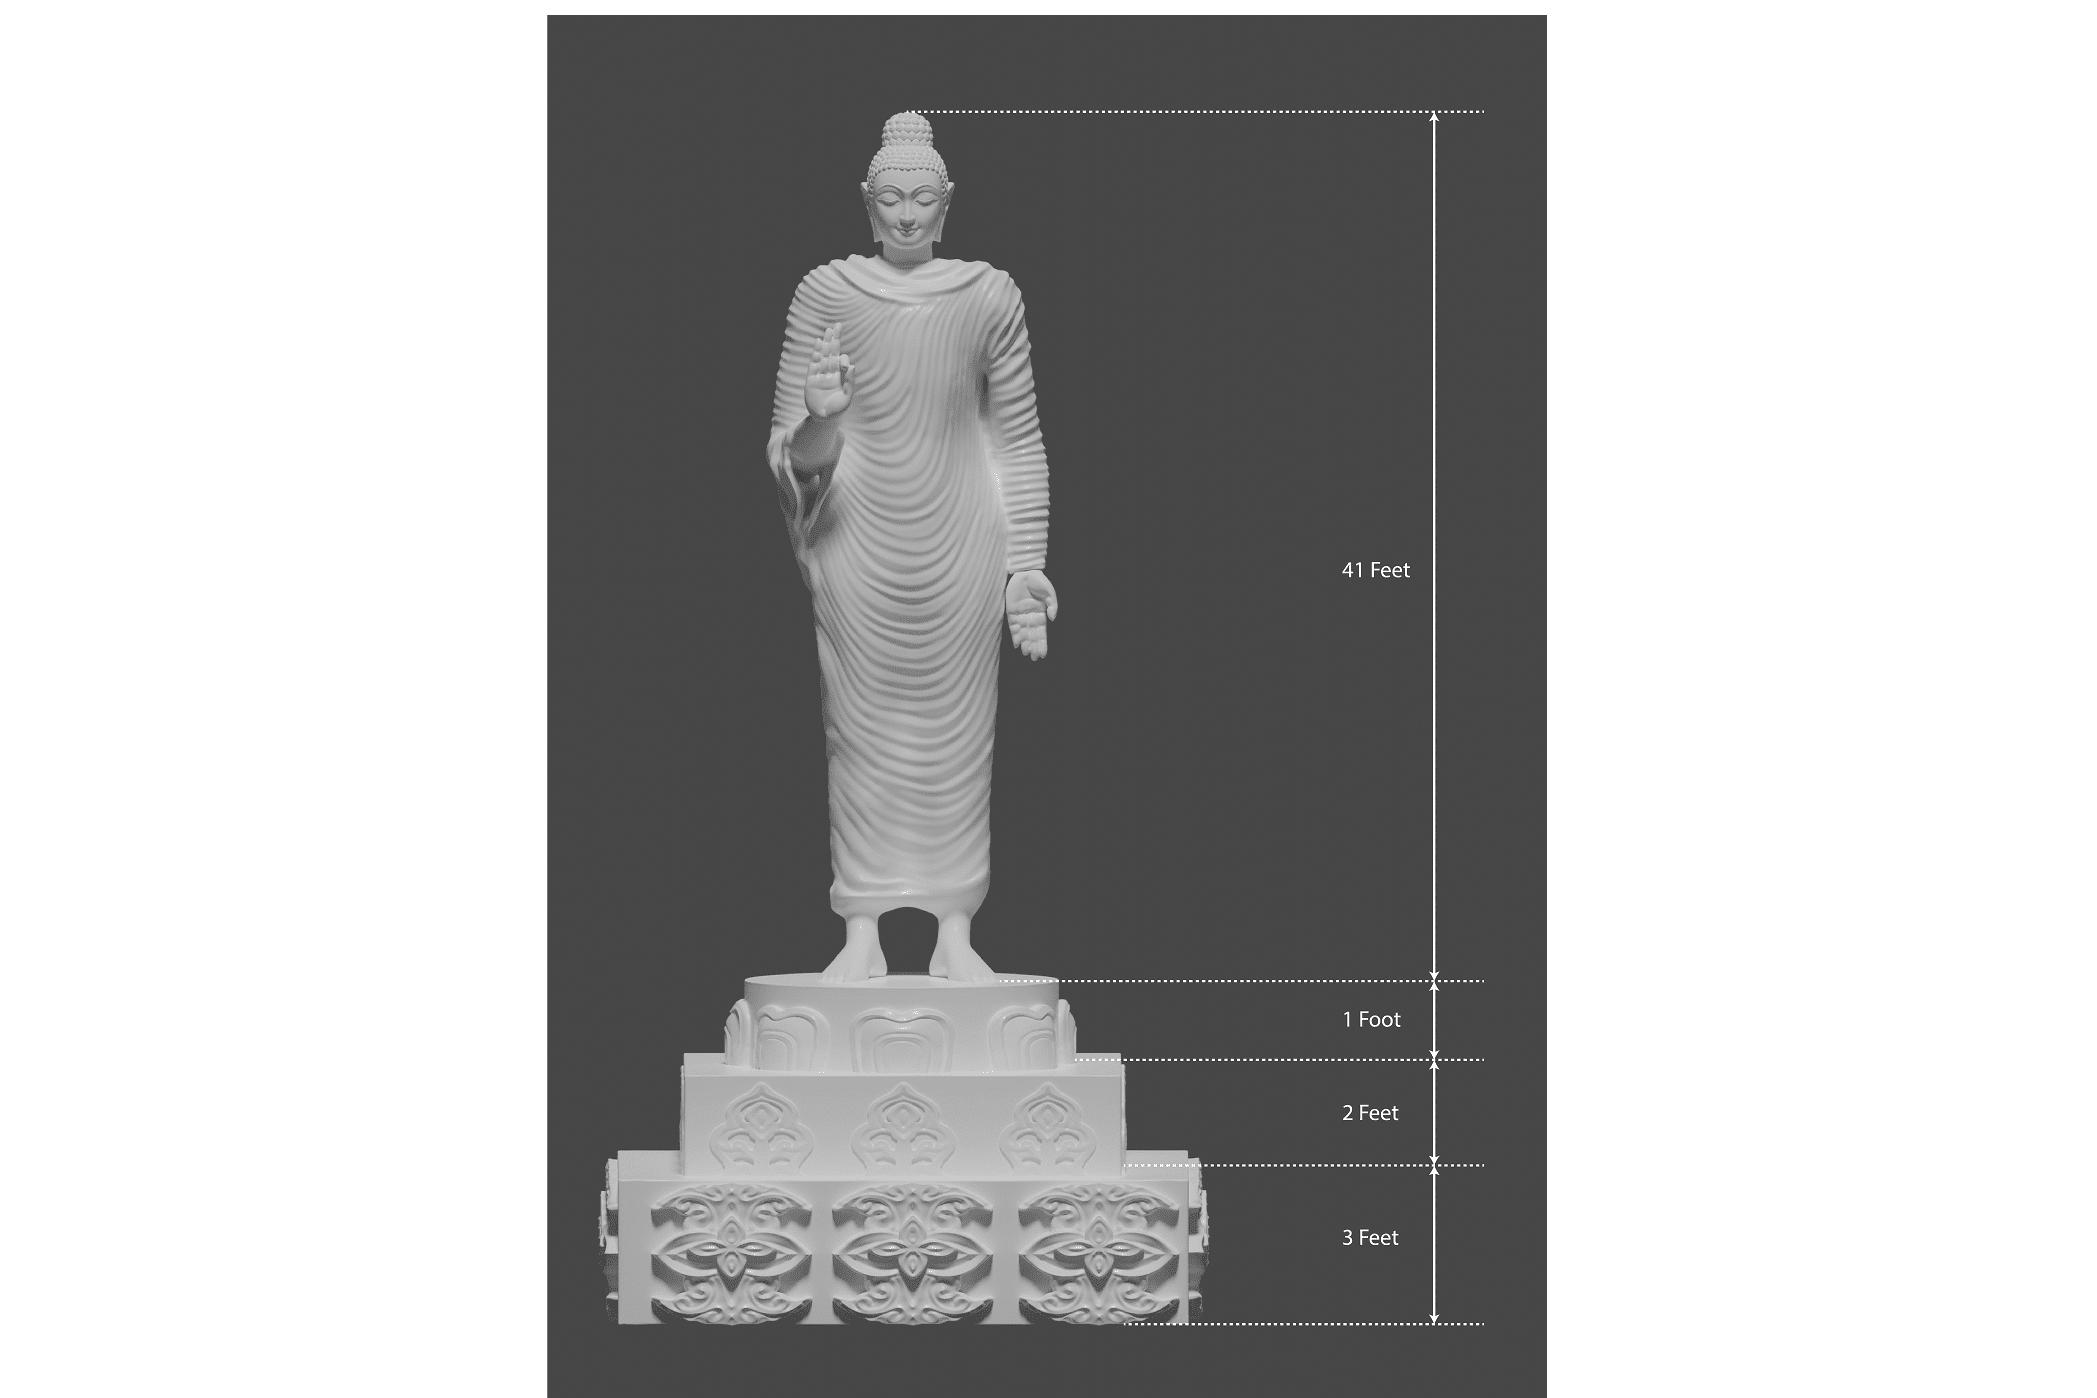 Portfolio for 3D Printing Design